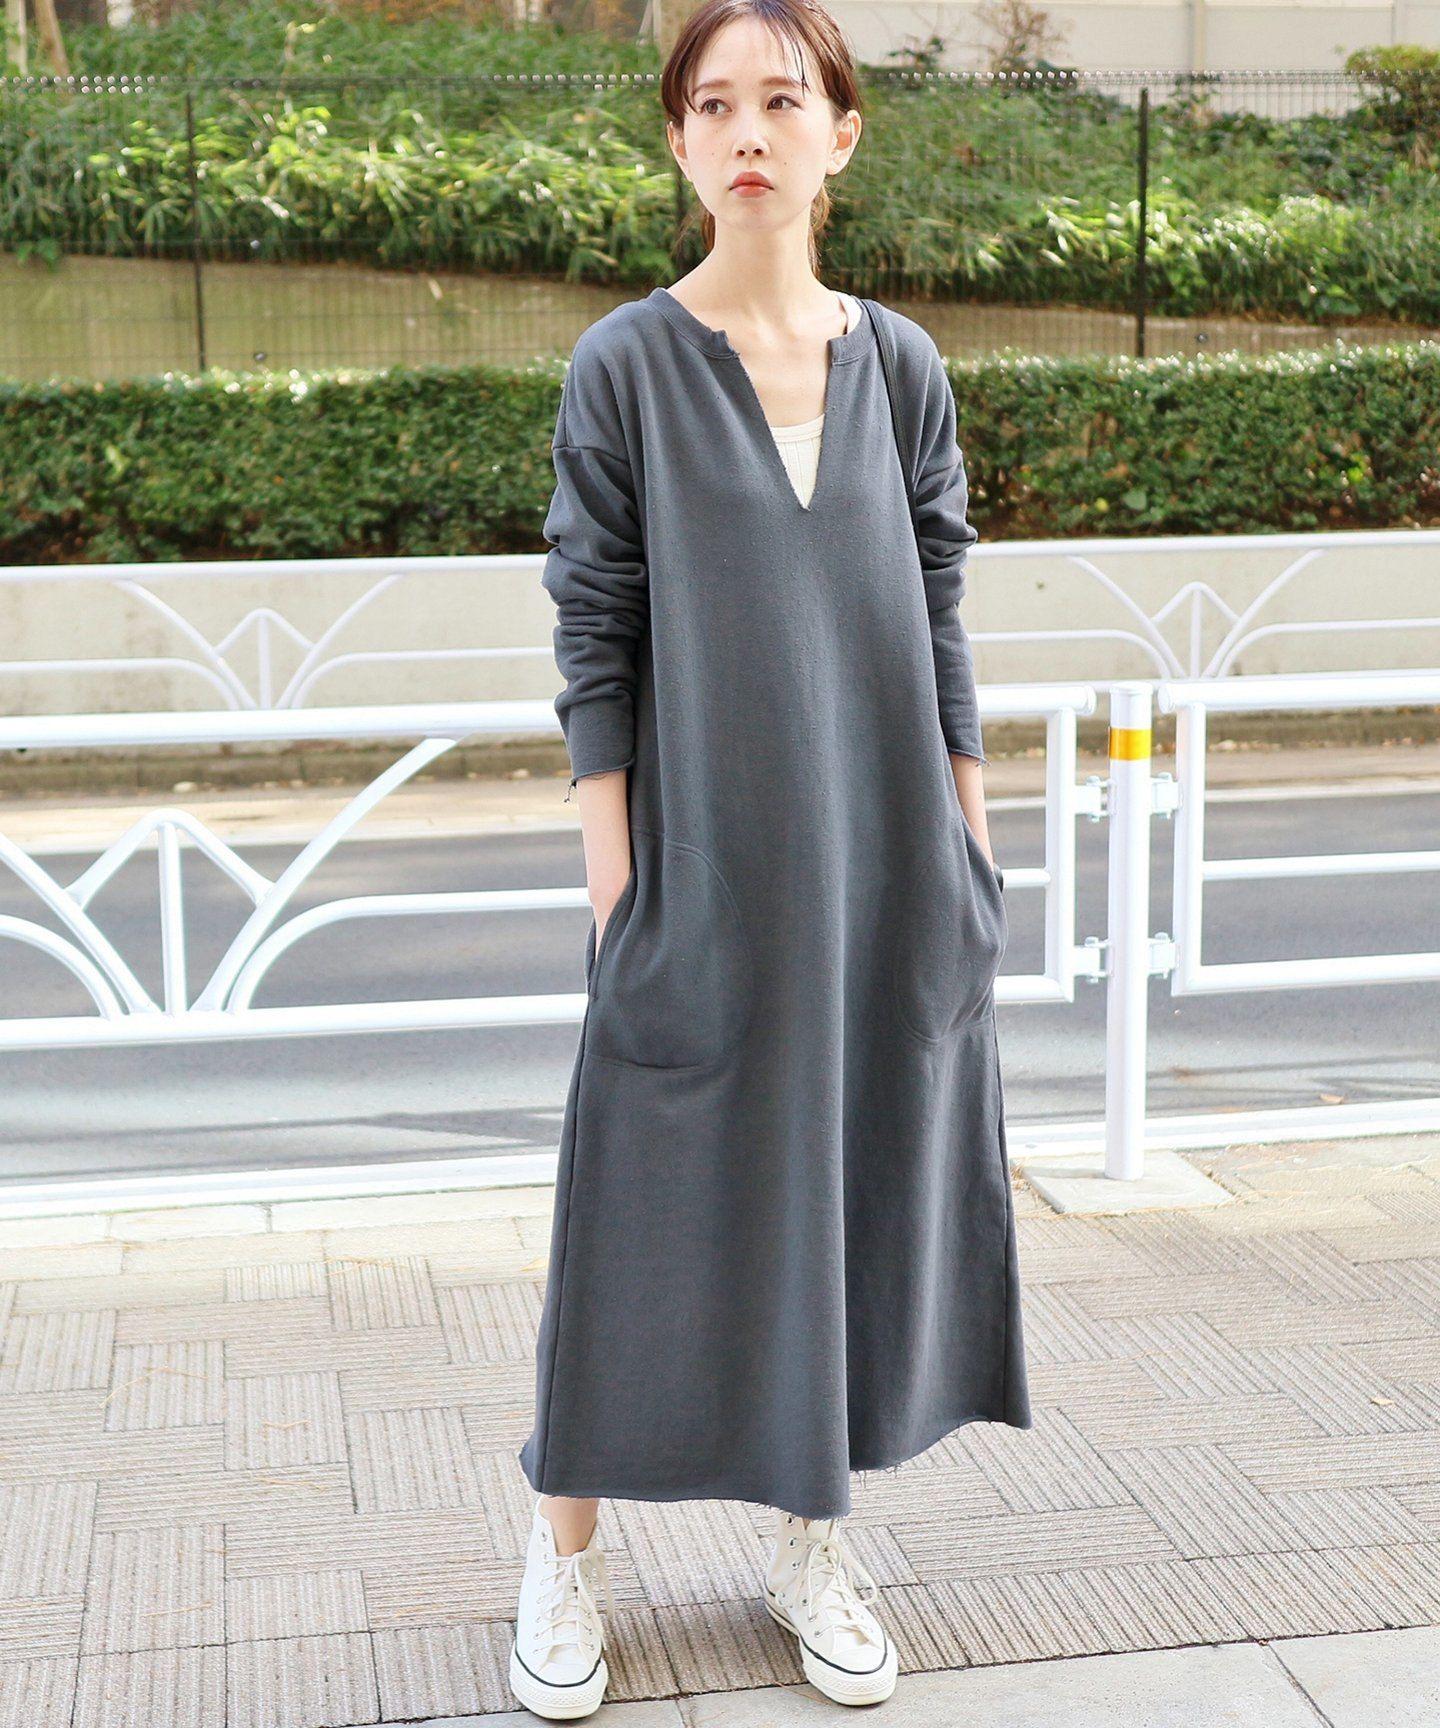 r jubilee iena 別注 sweat ワンピース iena イエナ 公式のファッション通販 19040910011610 baycrew s store ワンピース ドレス ファッション イエナ ワンピース